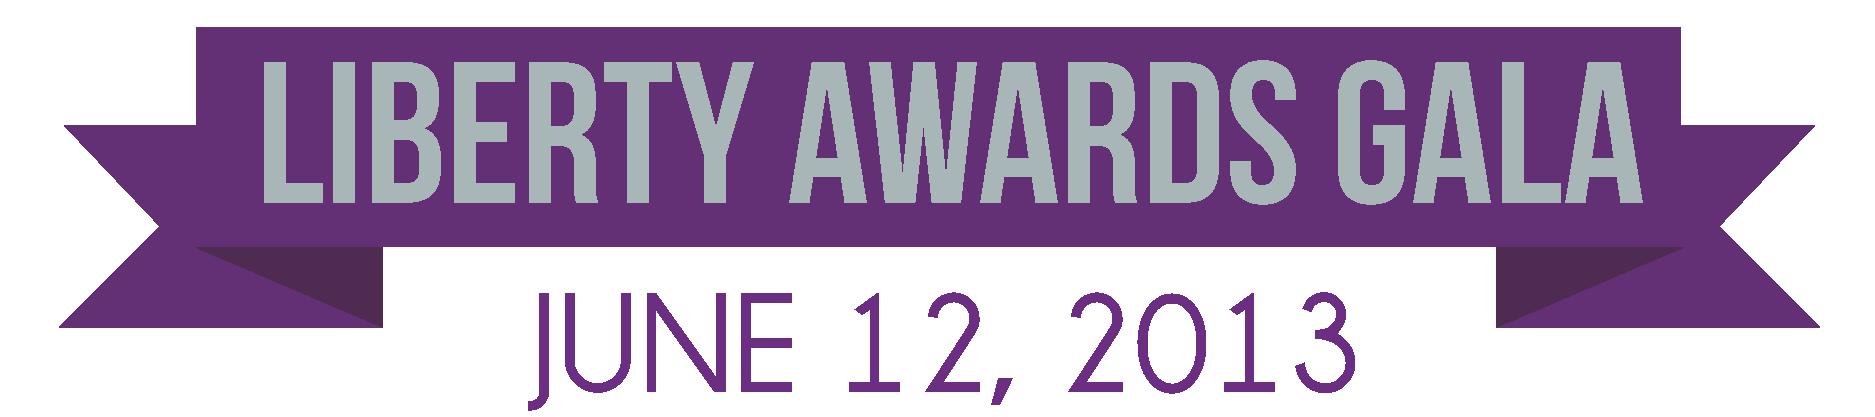 Liberty Awards Gala Banner